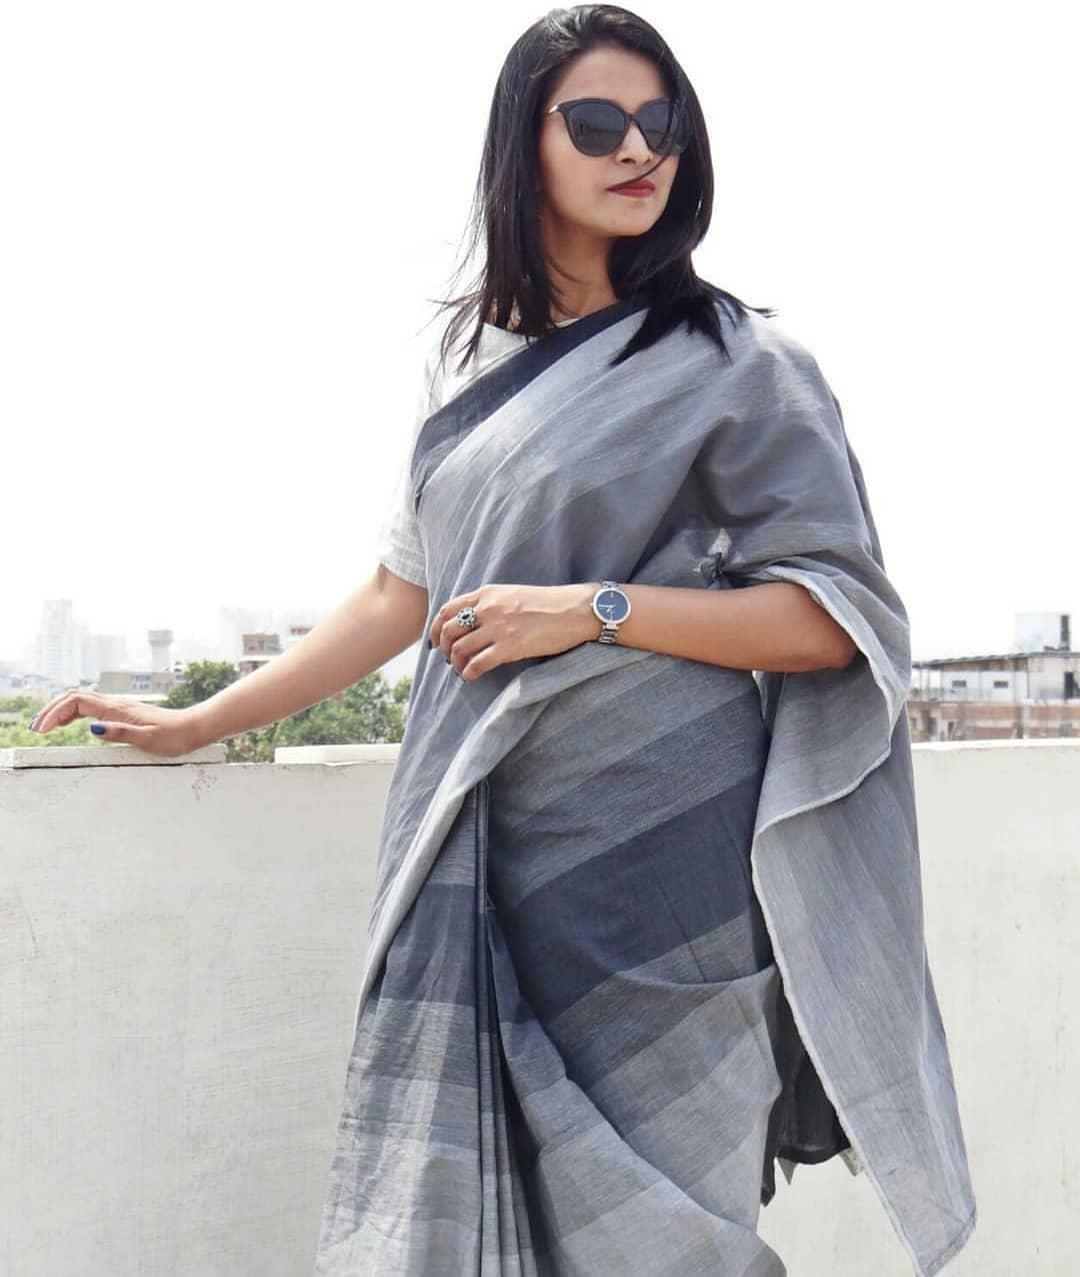 sun-glasses-and-sarees (14)